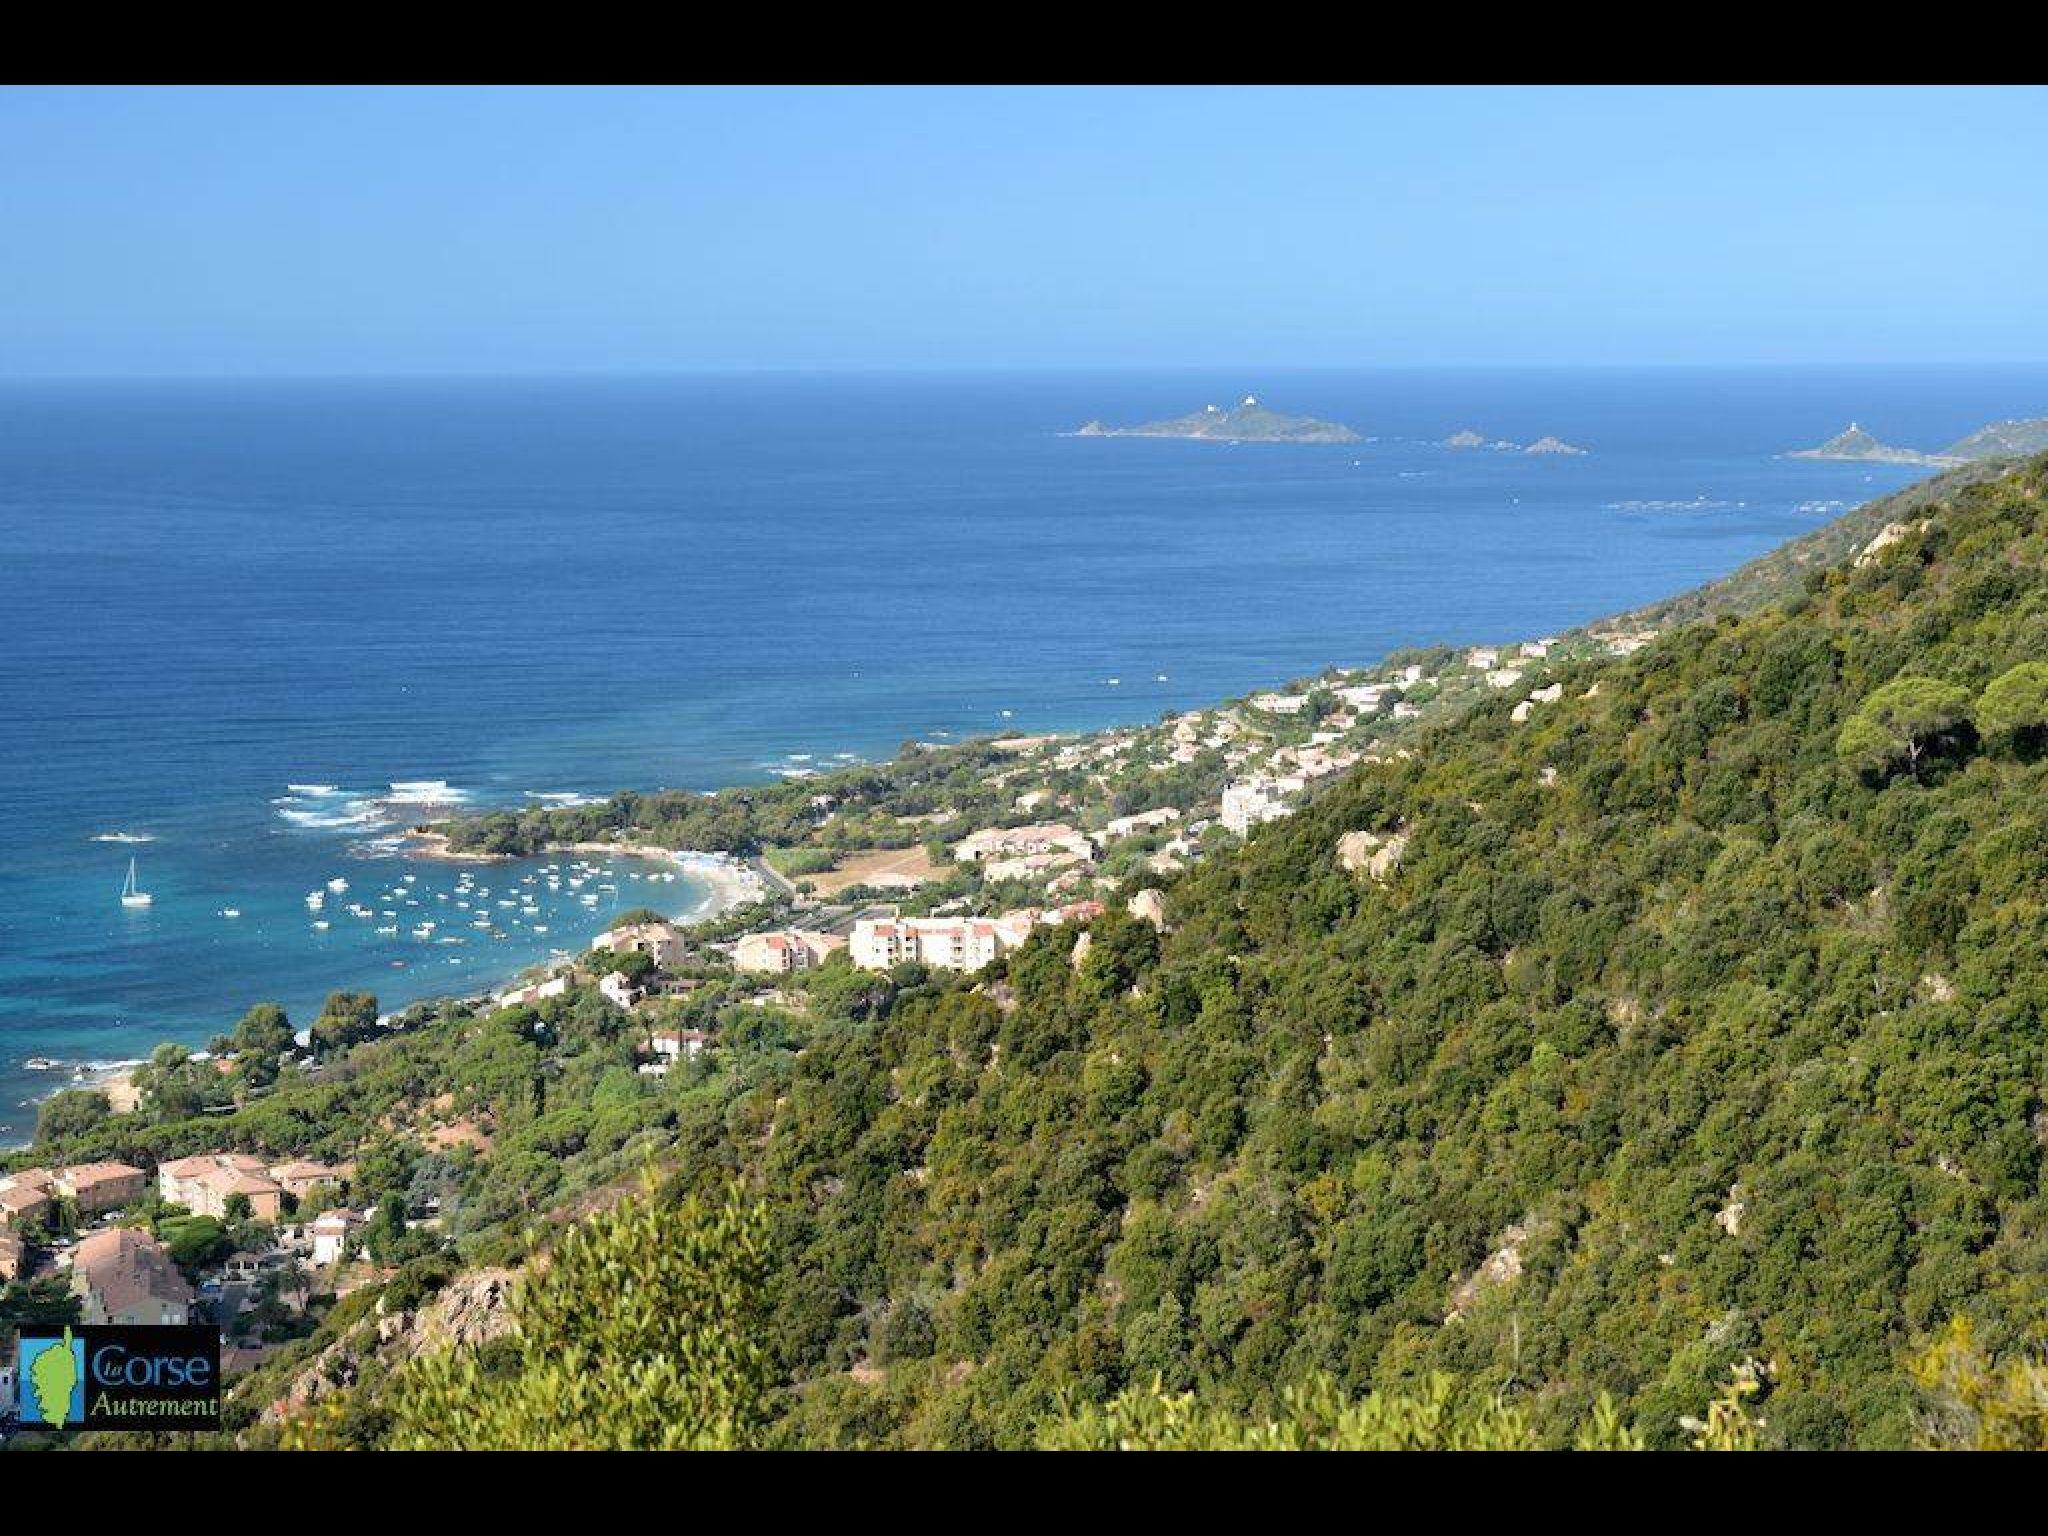 Home sweet Home Corse